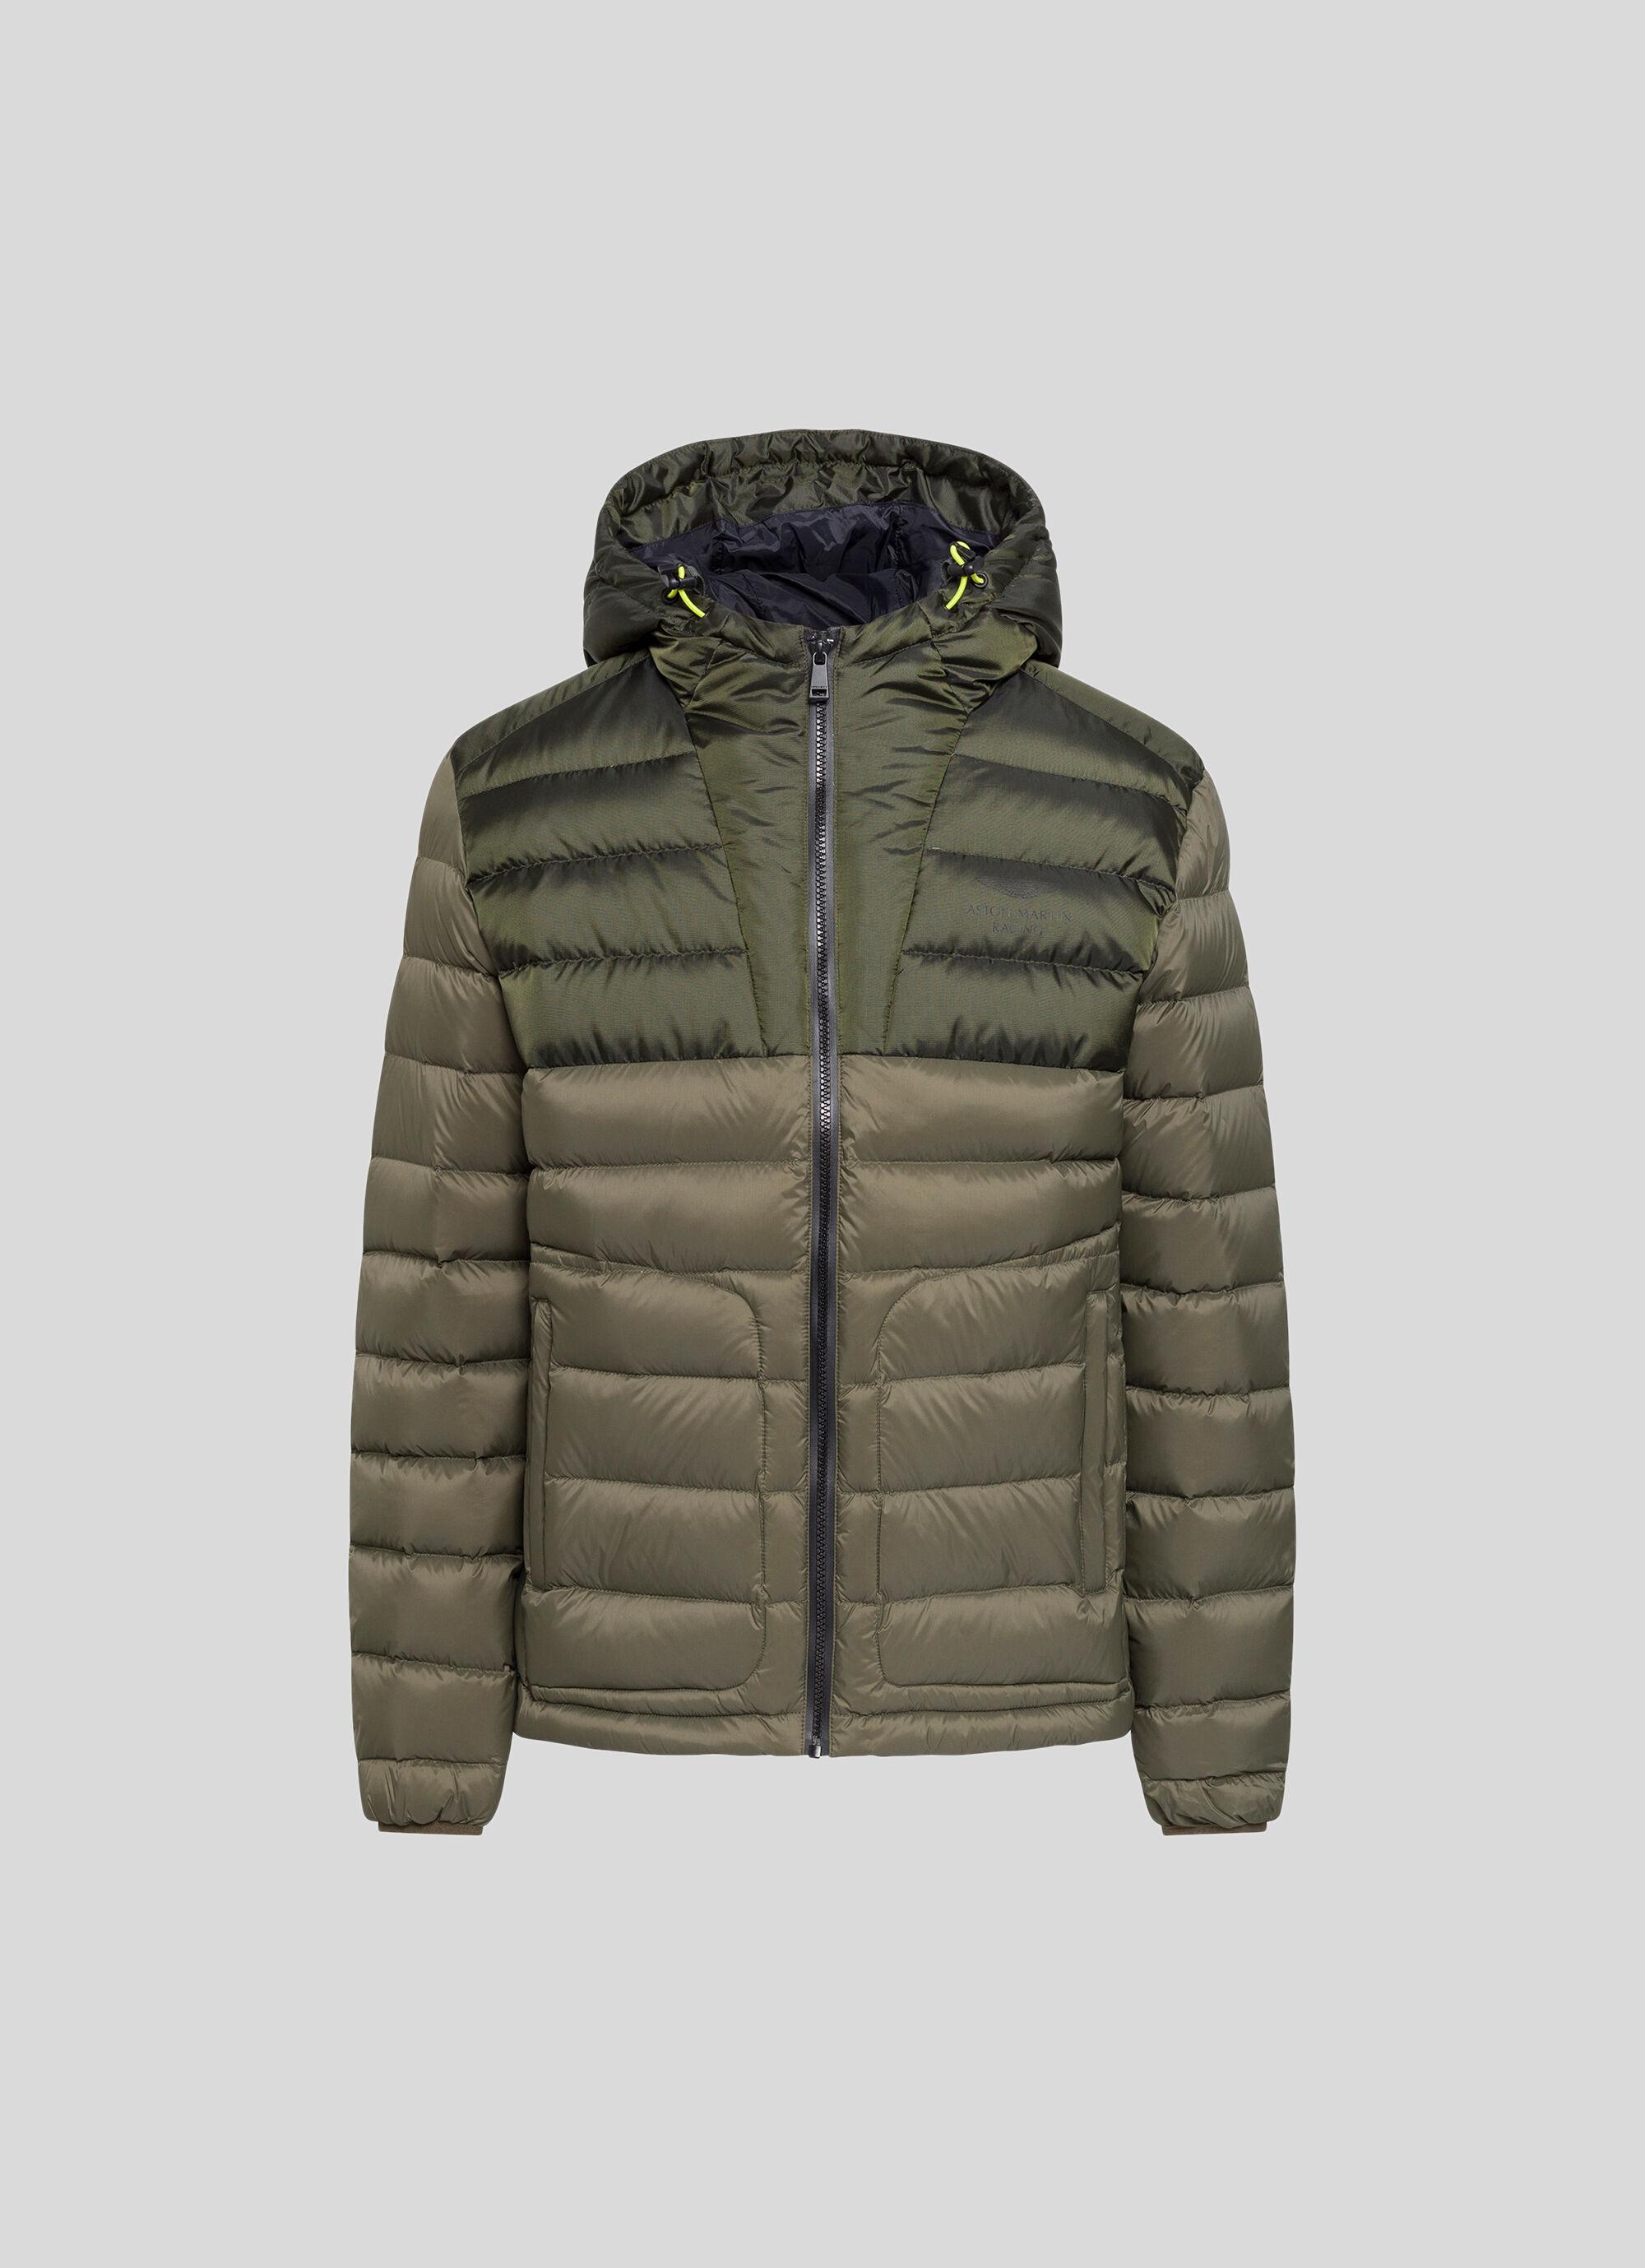 aston martin racing men's water-repellent hooded ski jacket | x-small | dark olive green